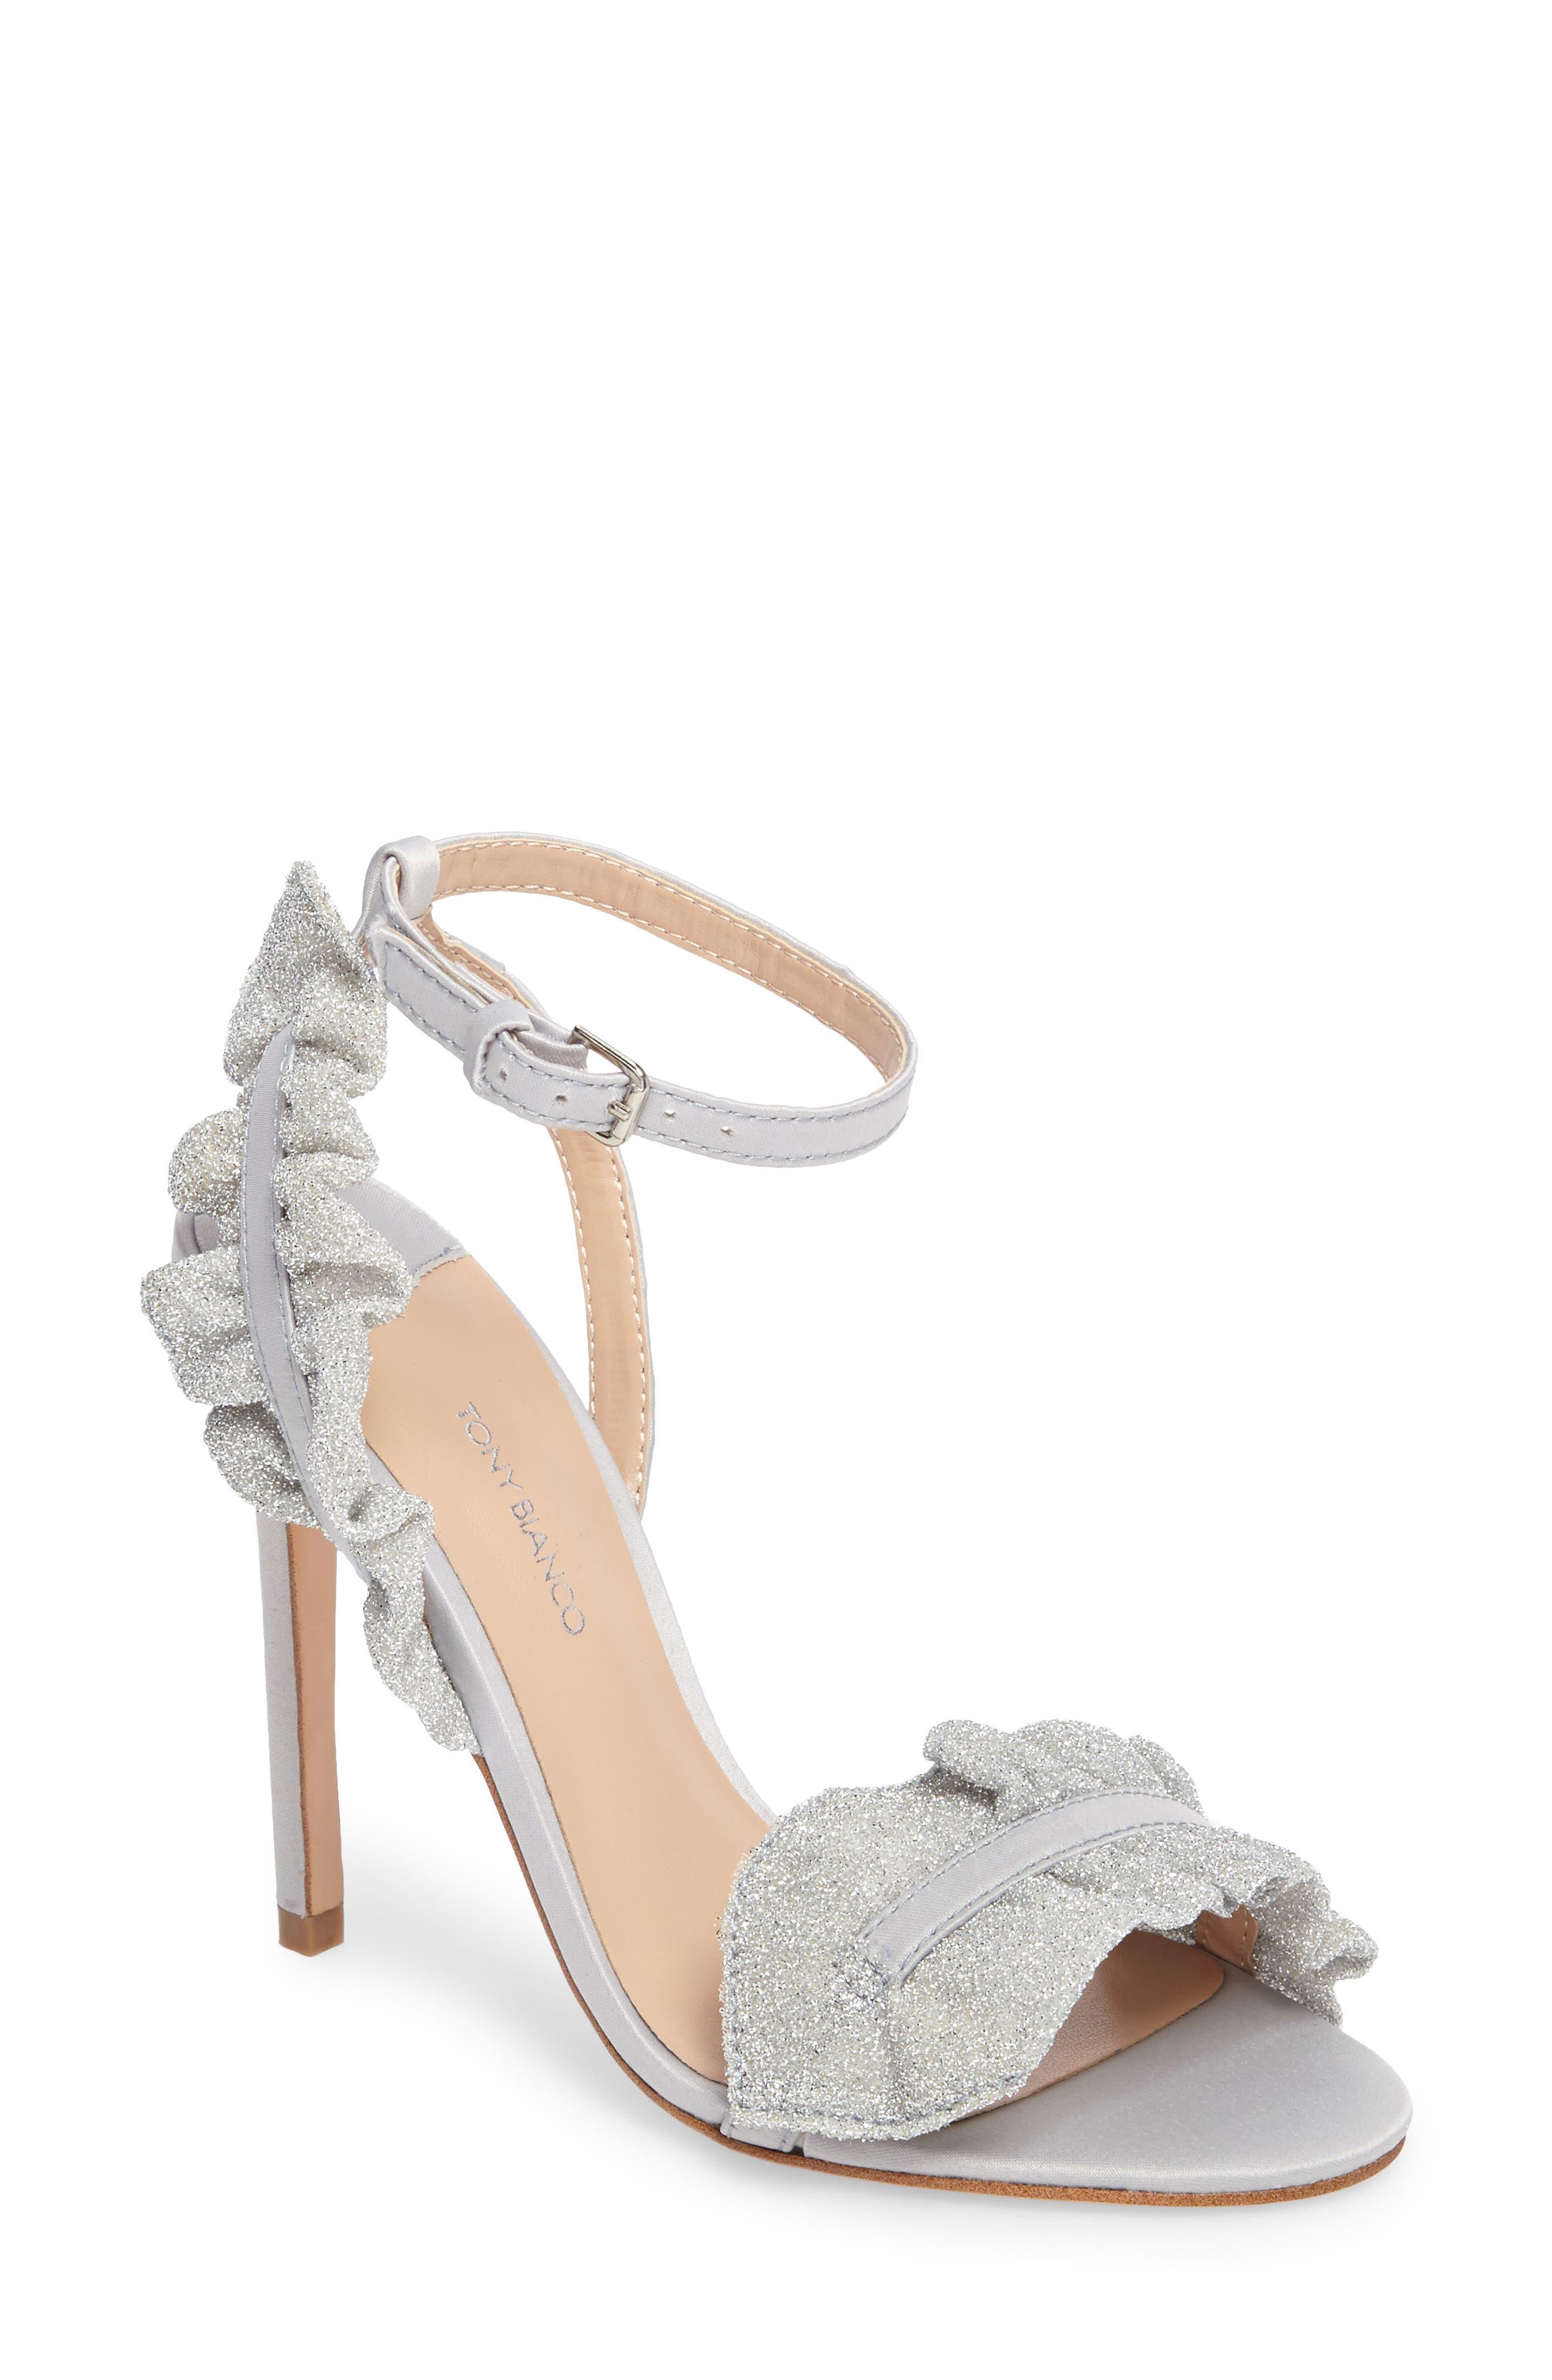 Main Image - Tony Bianco Katy Ruffle Sandal (Women)